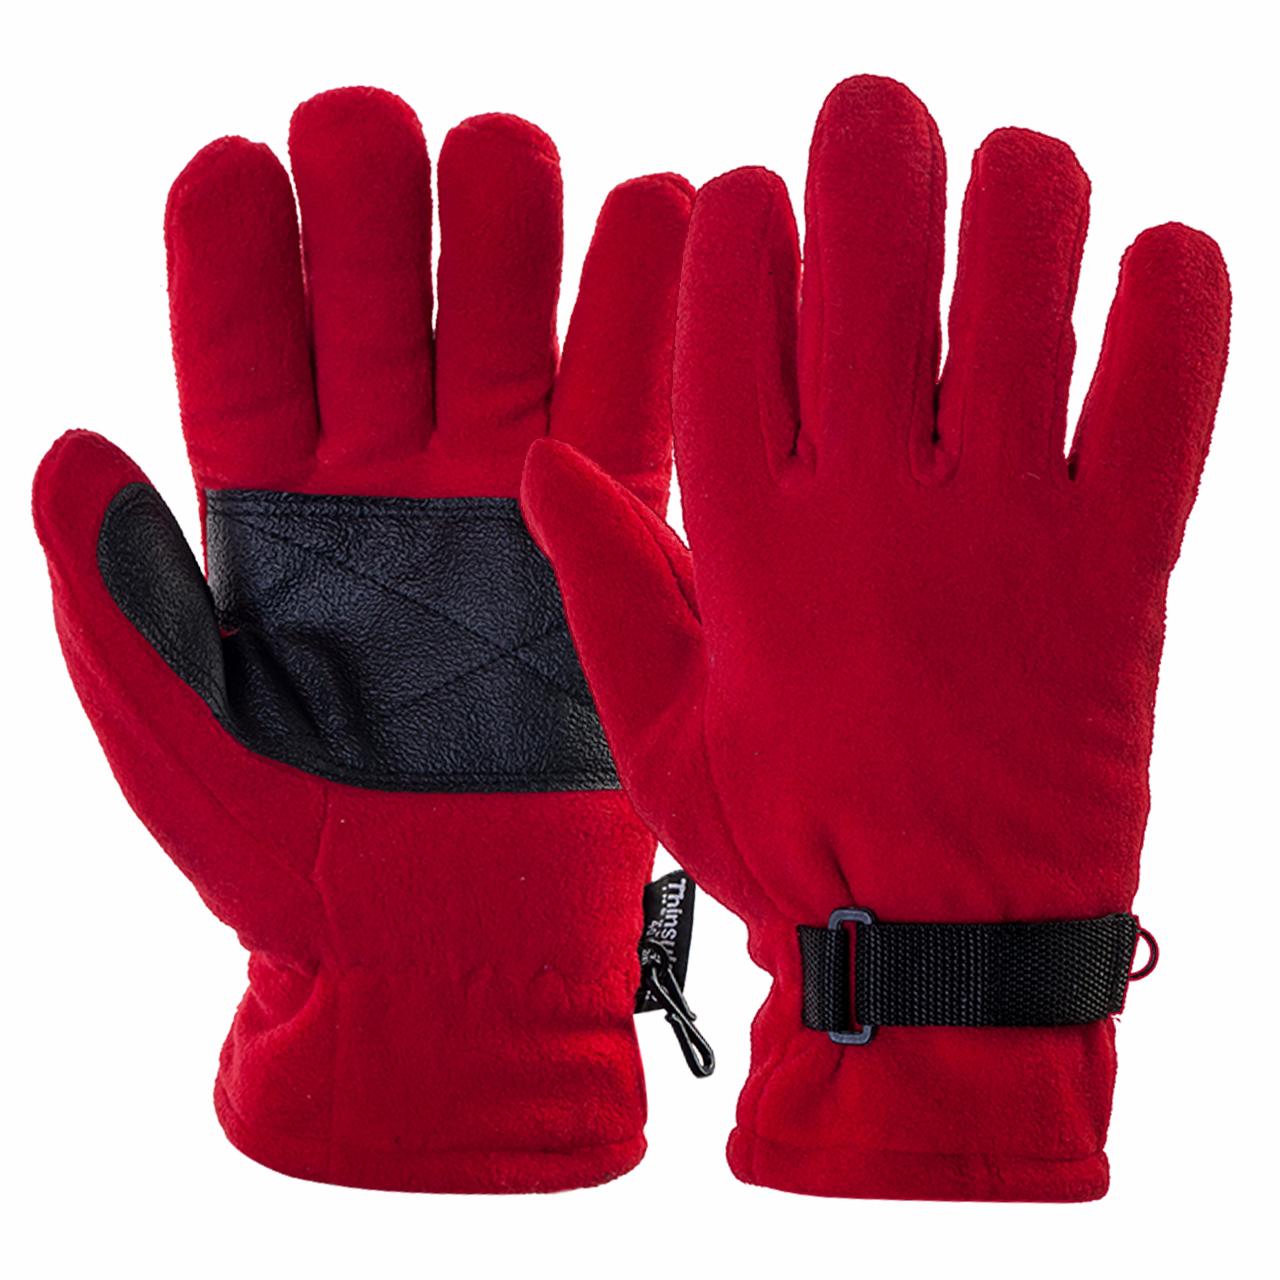 Перчатки красного цвета (флис + тинсулейт)